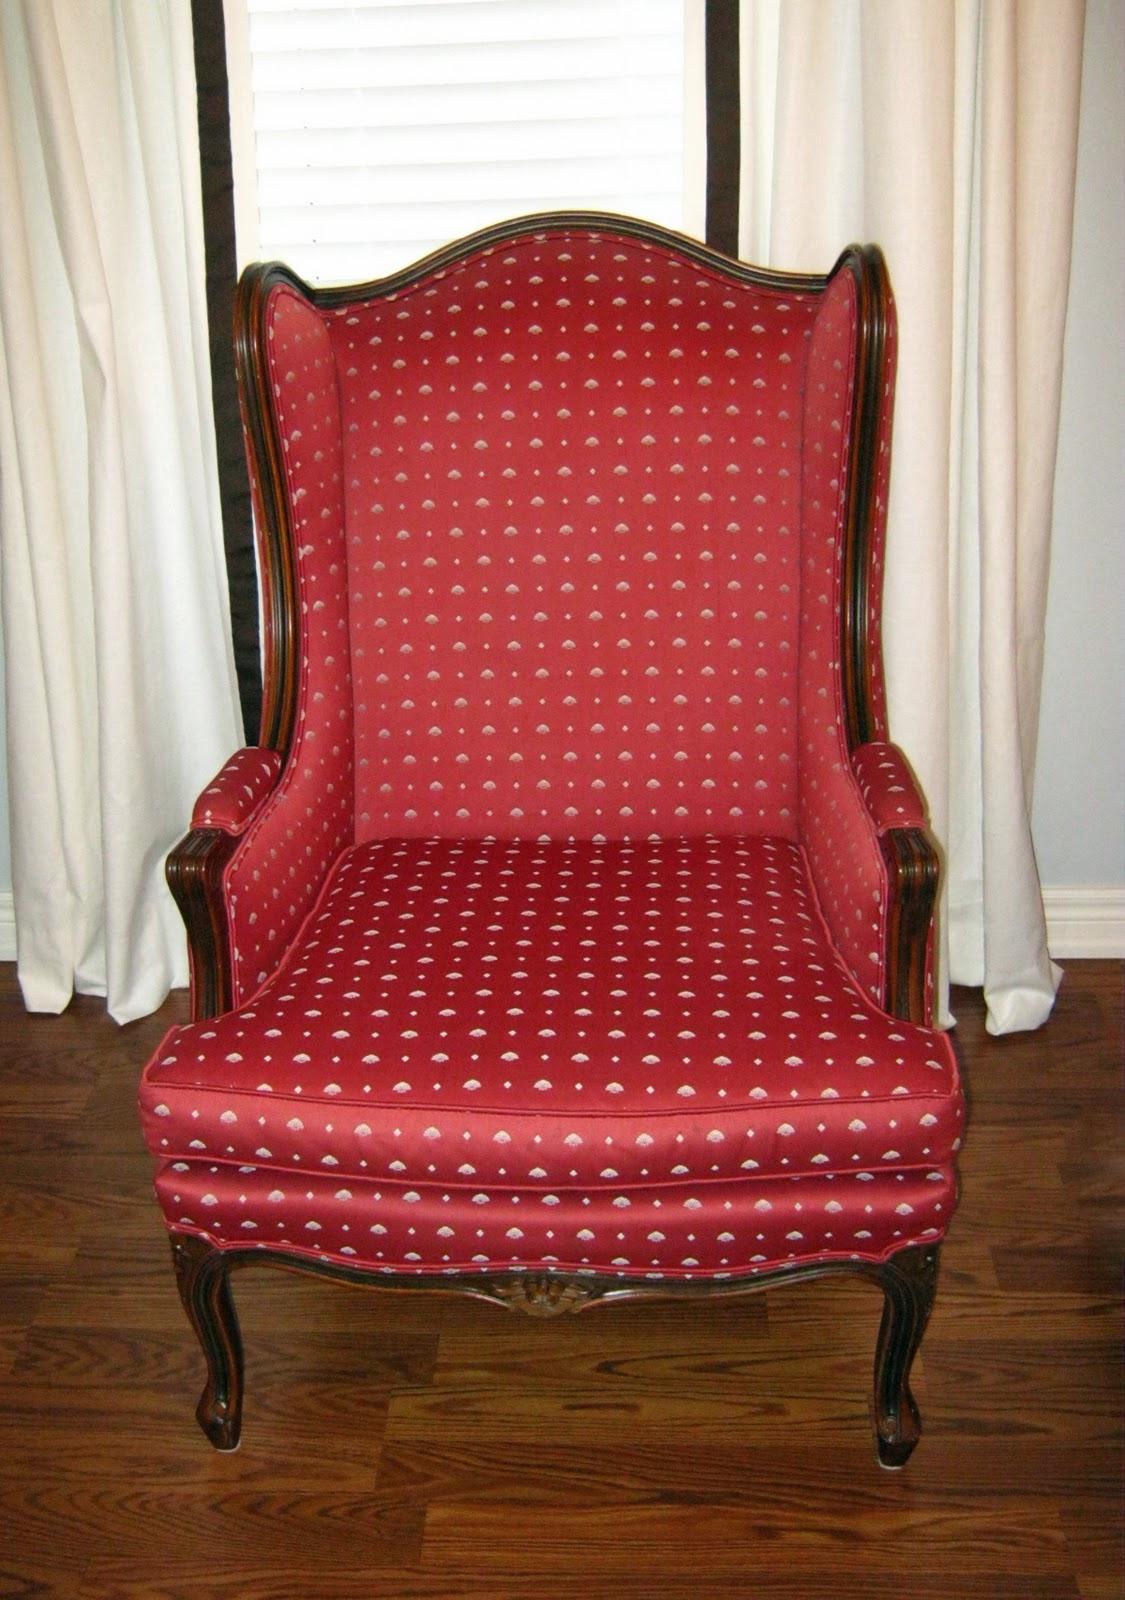 Astonishing Am Dolce Vita French Wing Chair Short Links Chair Design For Home Short Linksinfo